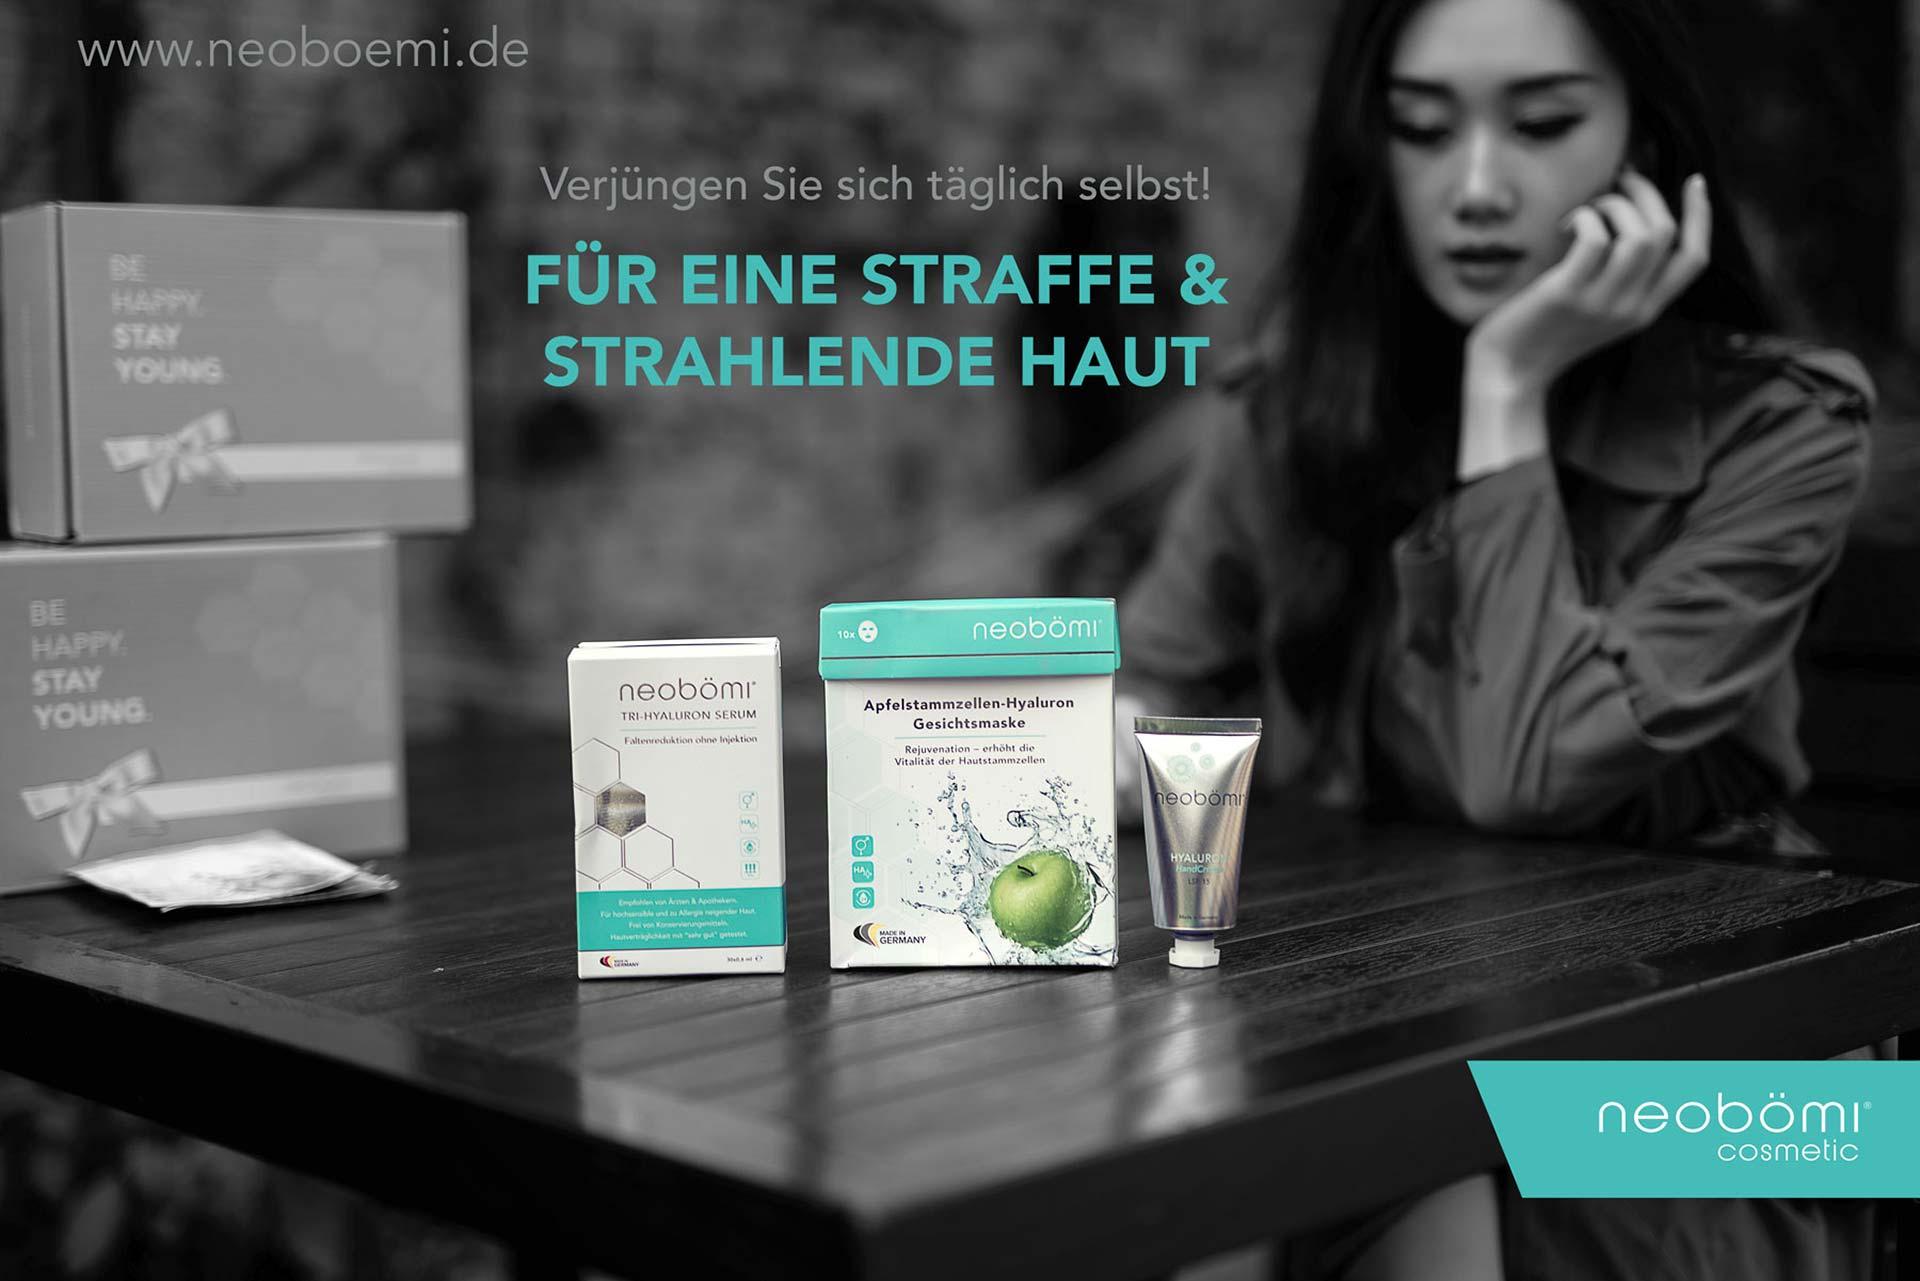 GEDLICH Racing - Premium Partner - Neoboemi